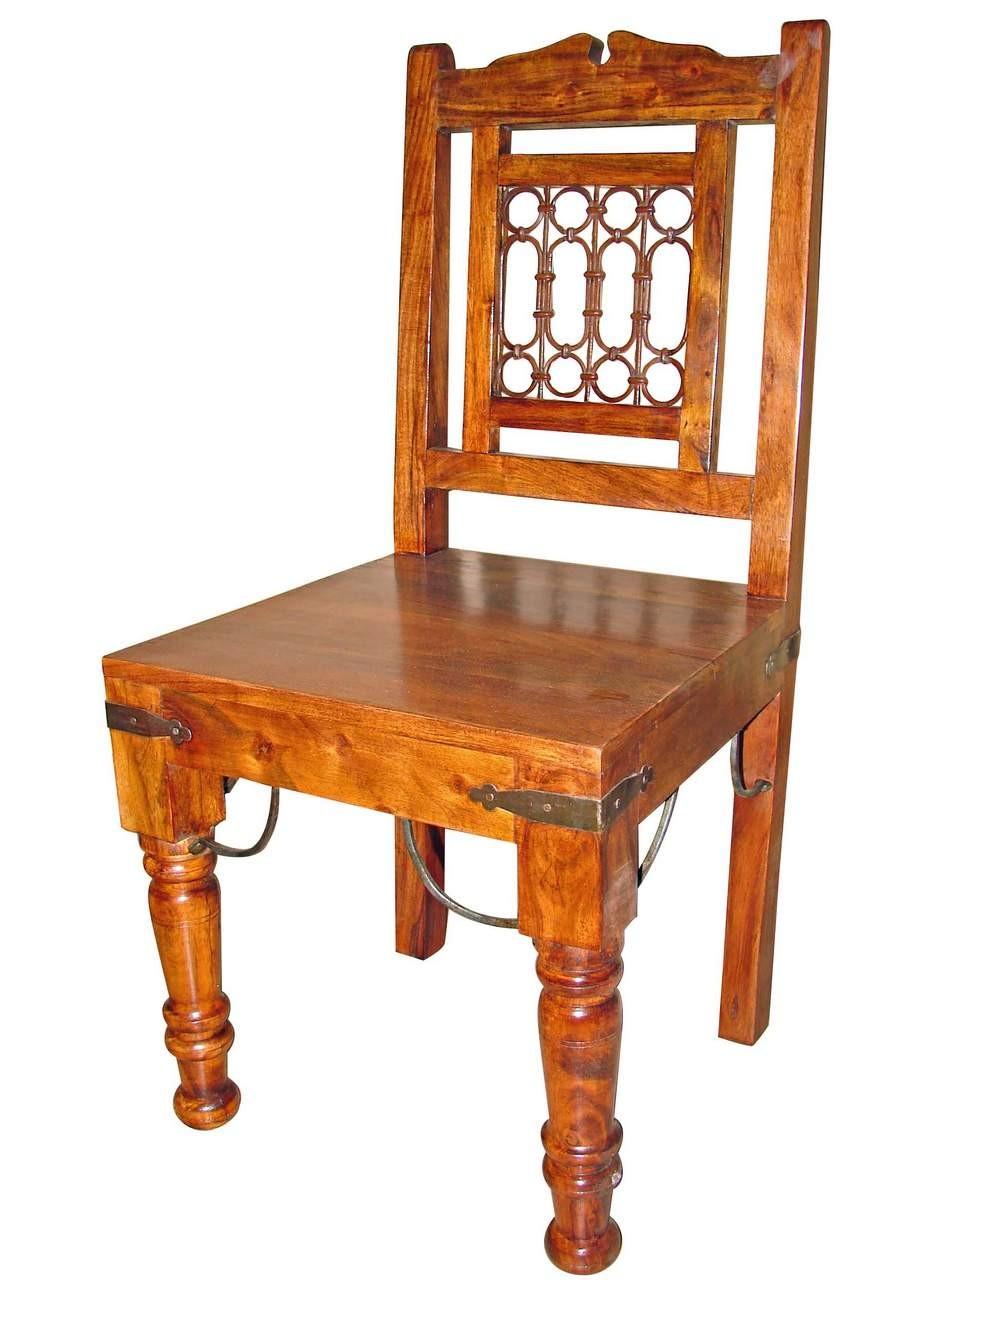 Unique Chairs For Dining Interior Design Scottsdale Az